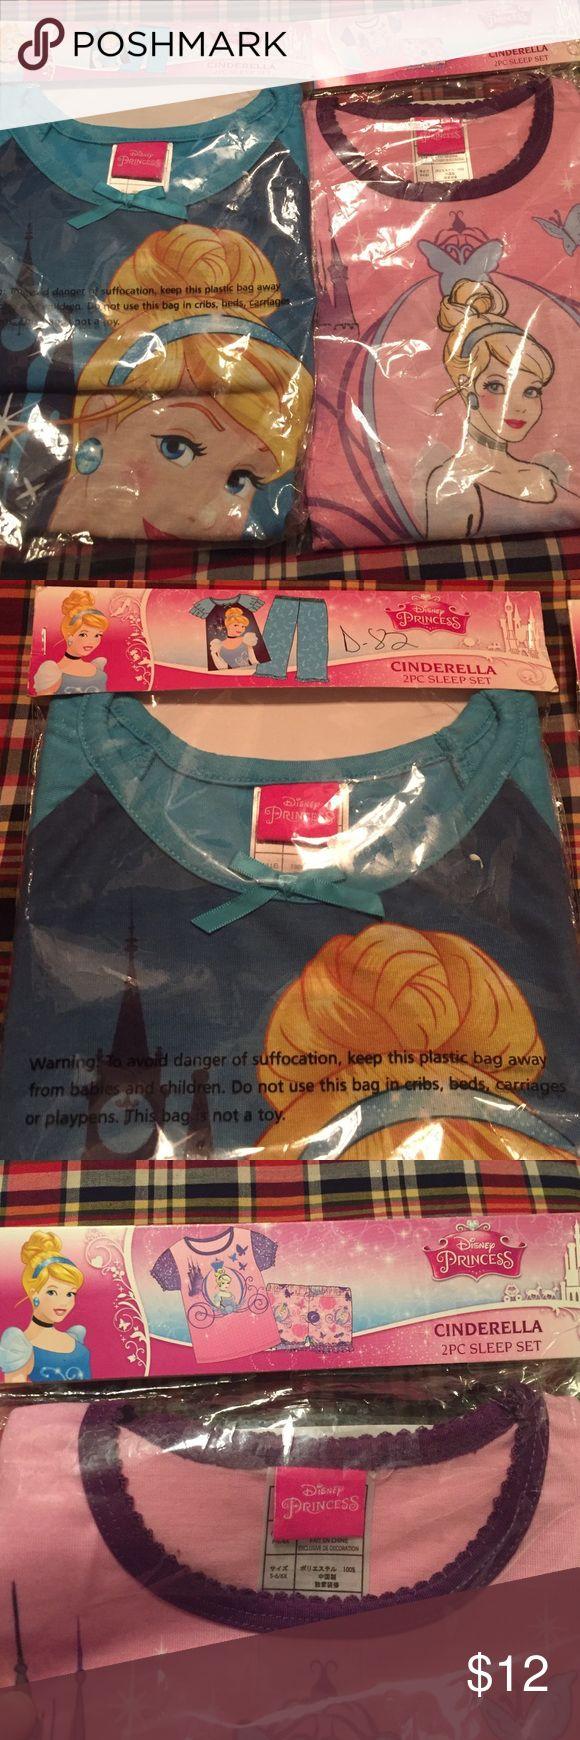 New Cinderella PJ's, Girls Small (6/6x),  set of 2 Set of 2 Cinderella PJ's, size Small (6-6x). Pink set is shorts and tee shirt and blue set is pants and tee shirt. Great for Christmas!! Disney Pajamas Pajama Sets